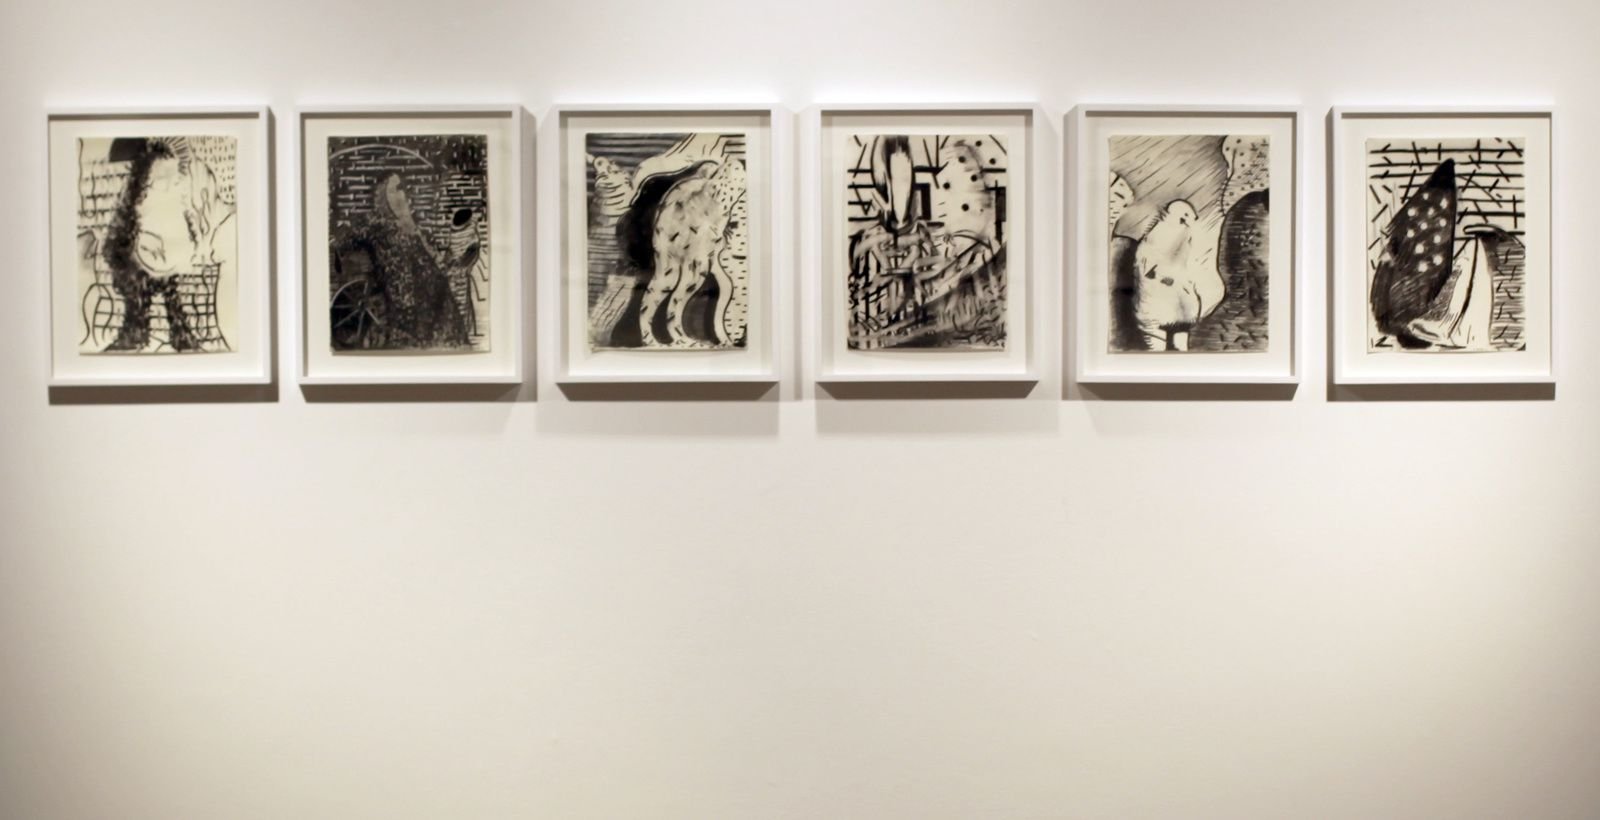 Vue de l'exposition d'Ali Banisadr - Courtesy Galerie Thaddaeus Ropac Marais © Photo Éric Simon